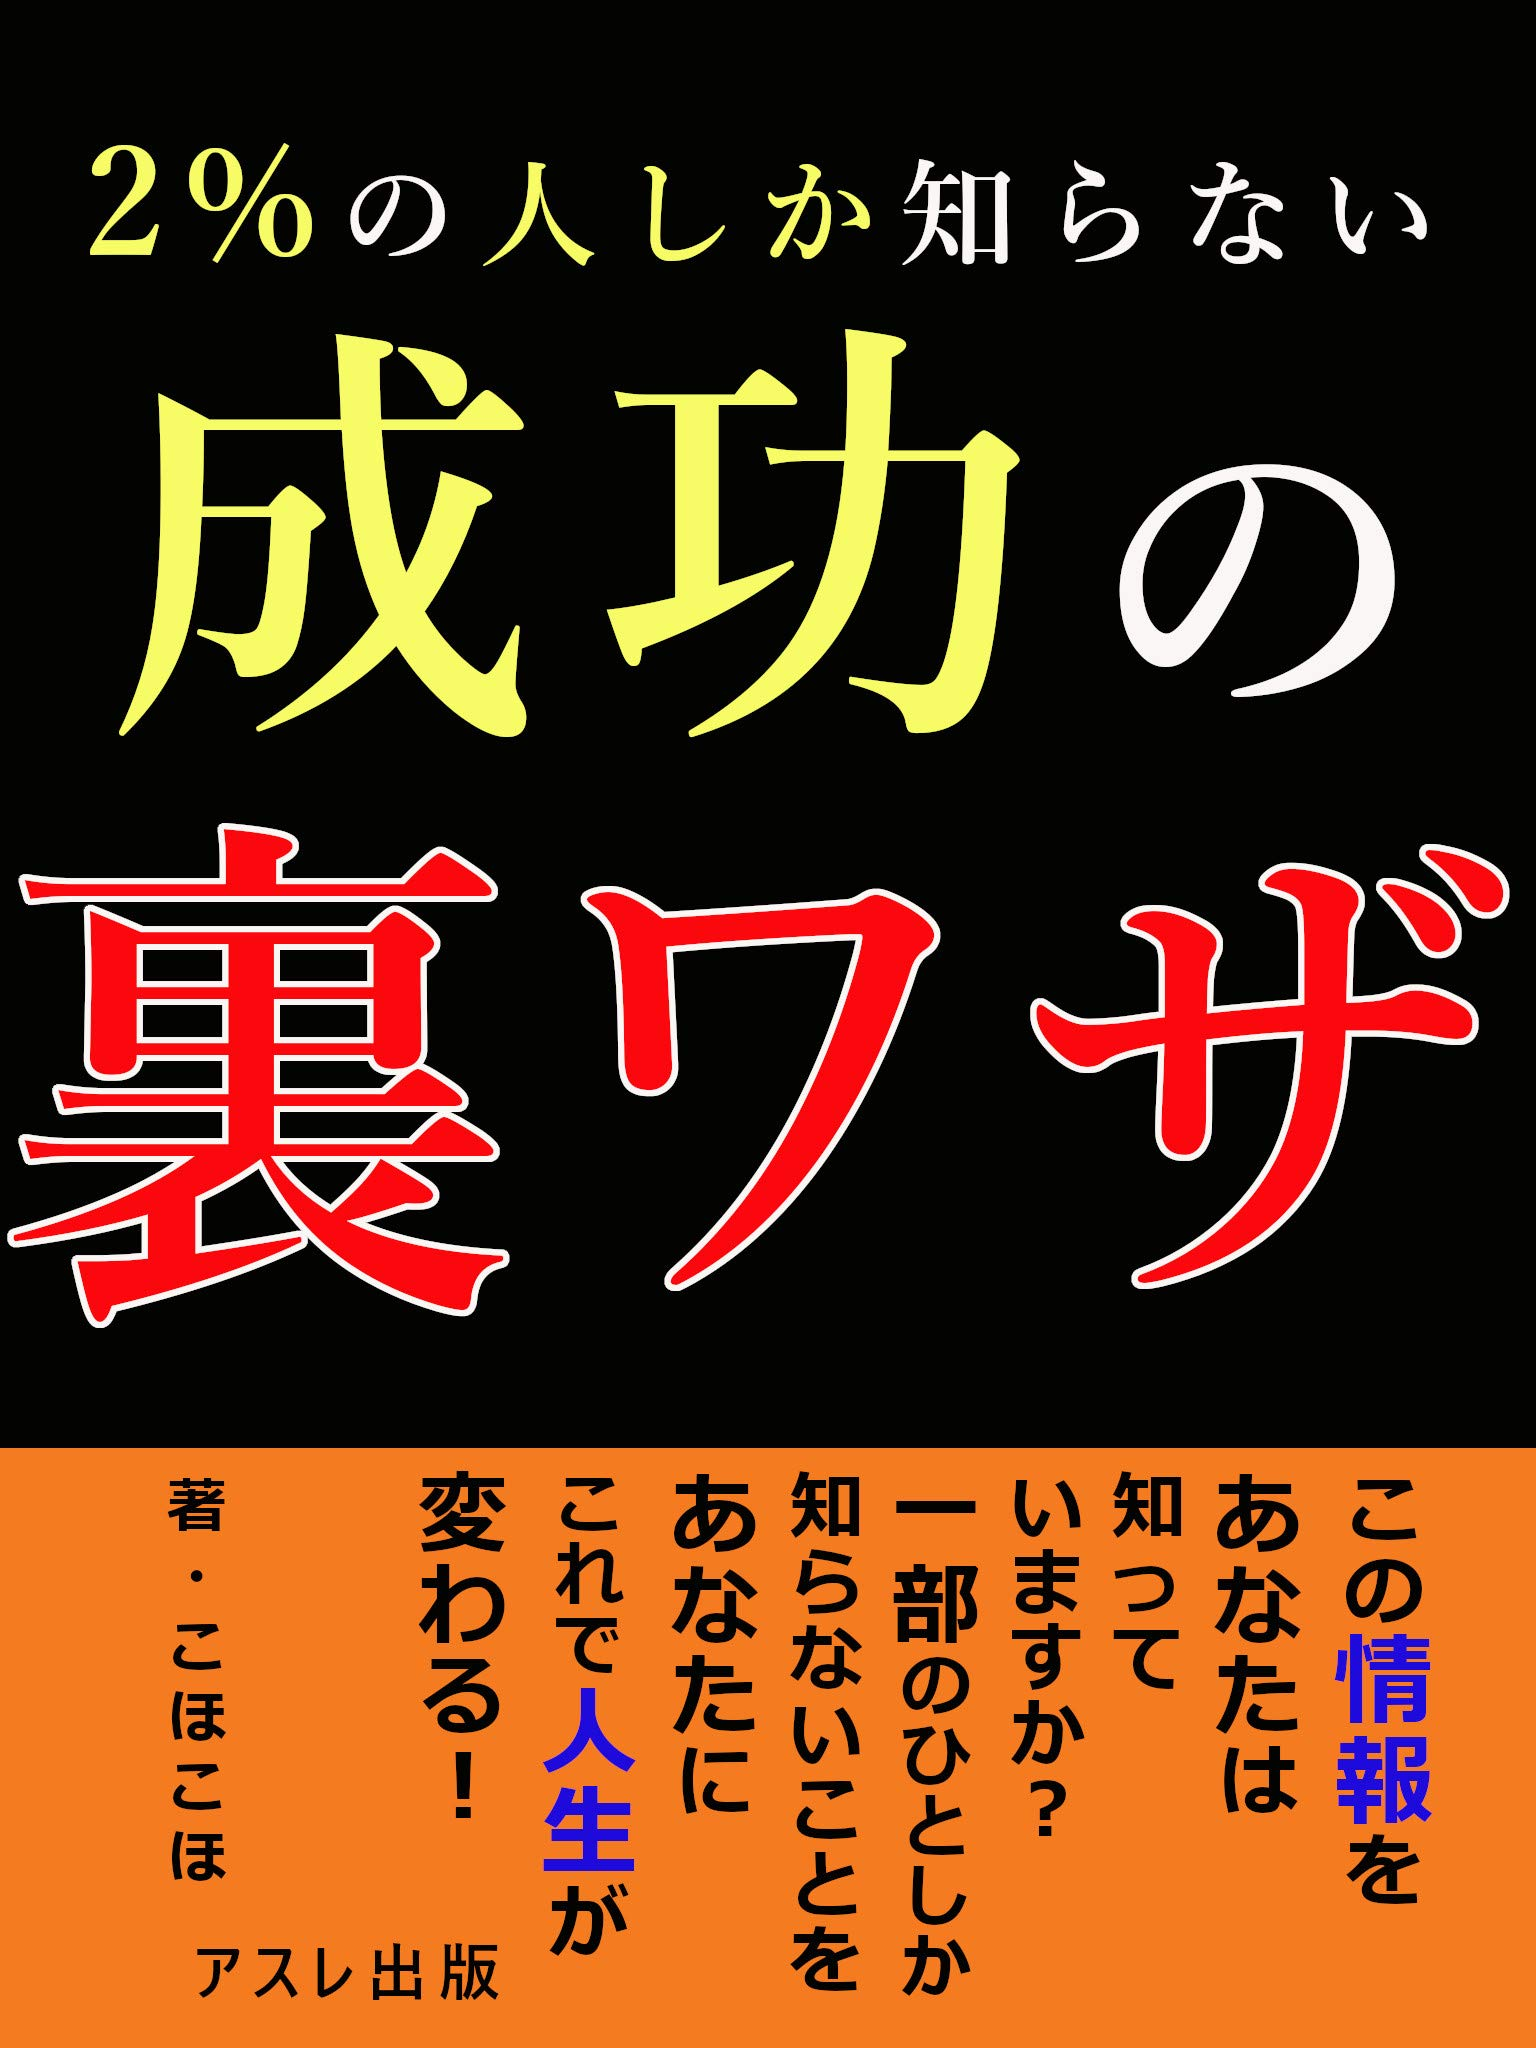 nipaasentonohitosikasiranaiseikounourawaza: itinitijyuppundejinseigakawaru (Japanese Edition)